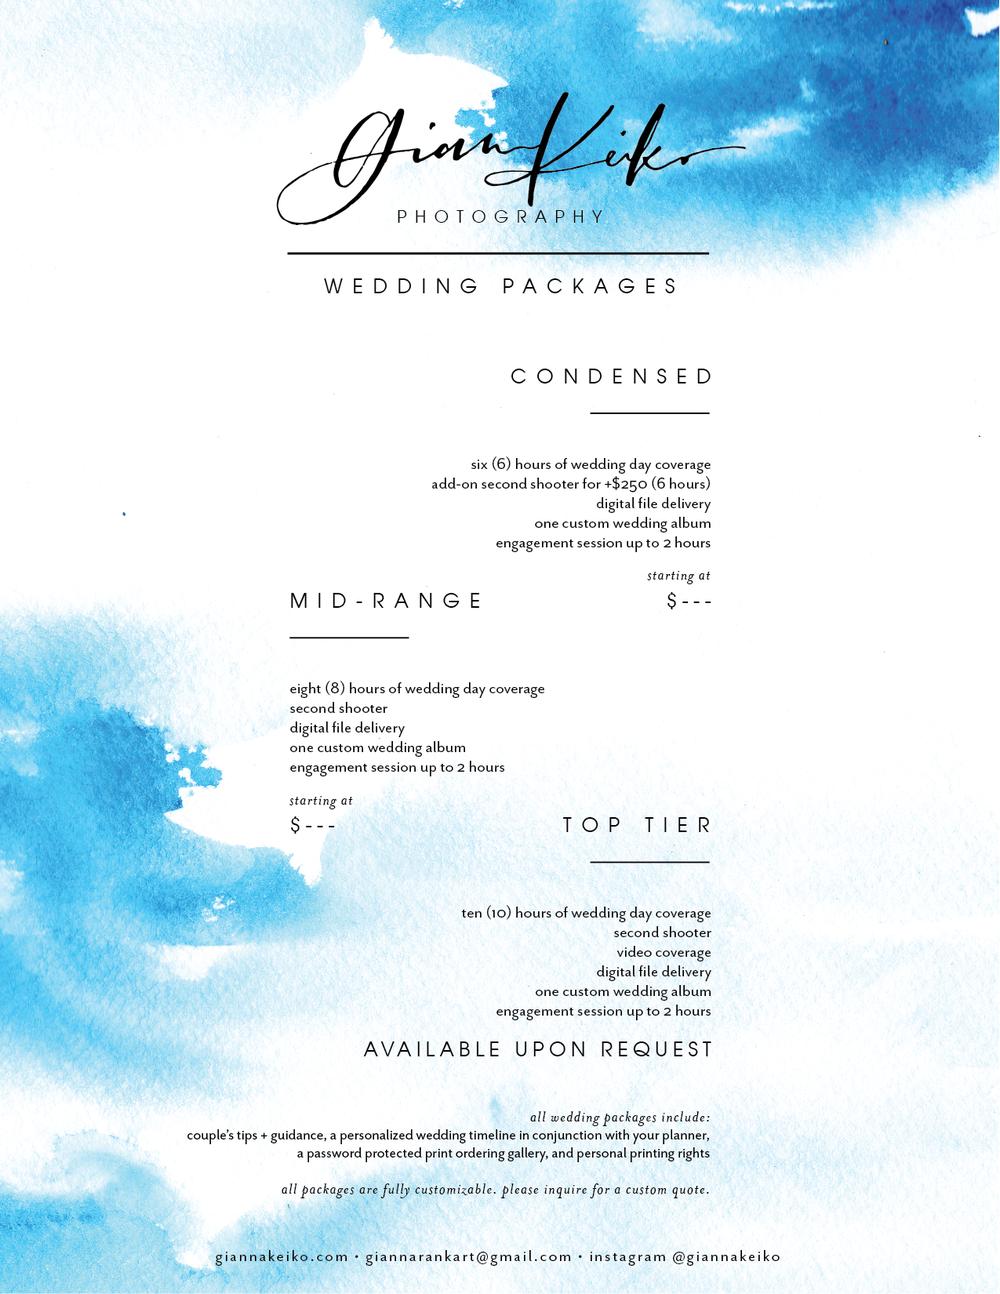 gianna-proposals-finals_wedding-rates.png